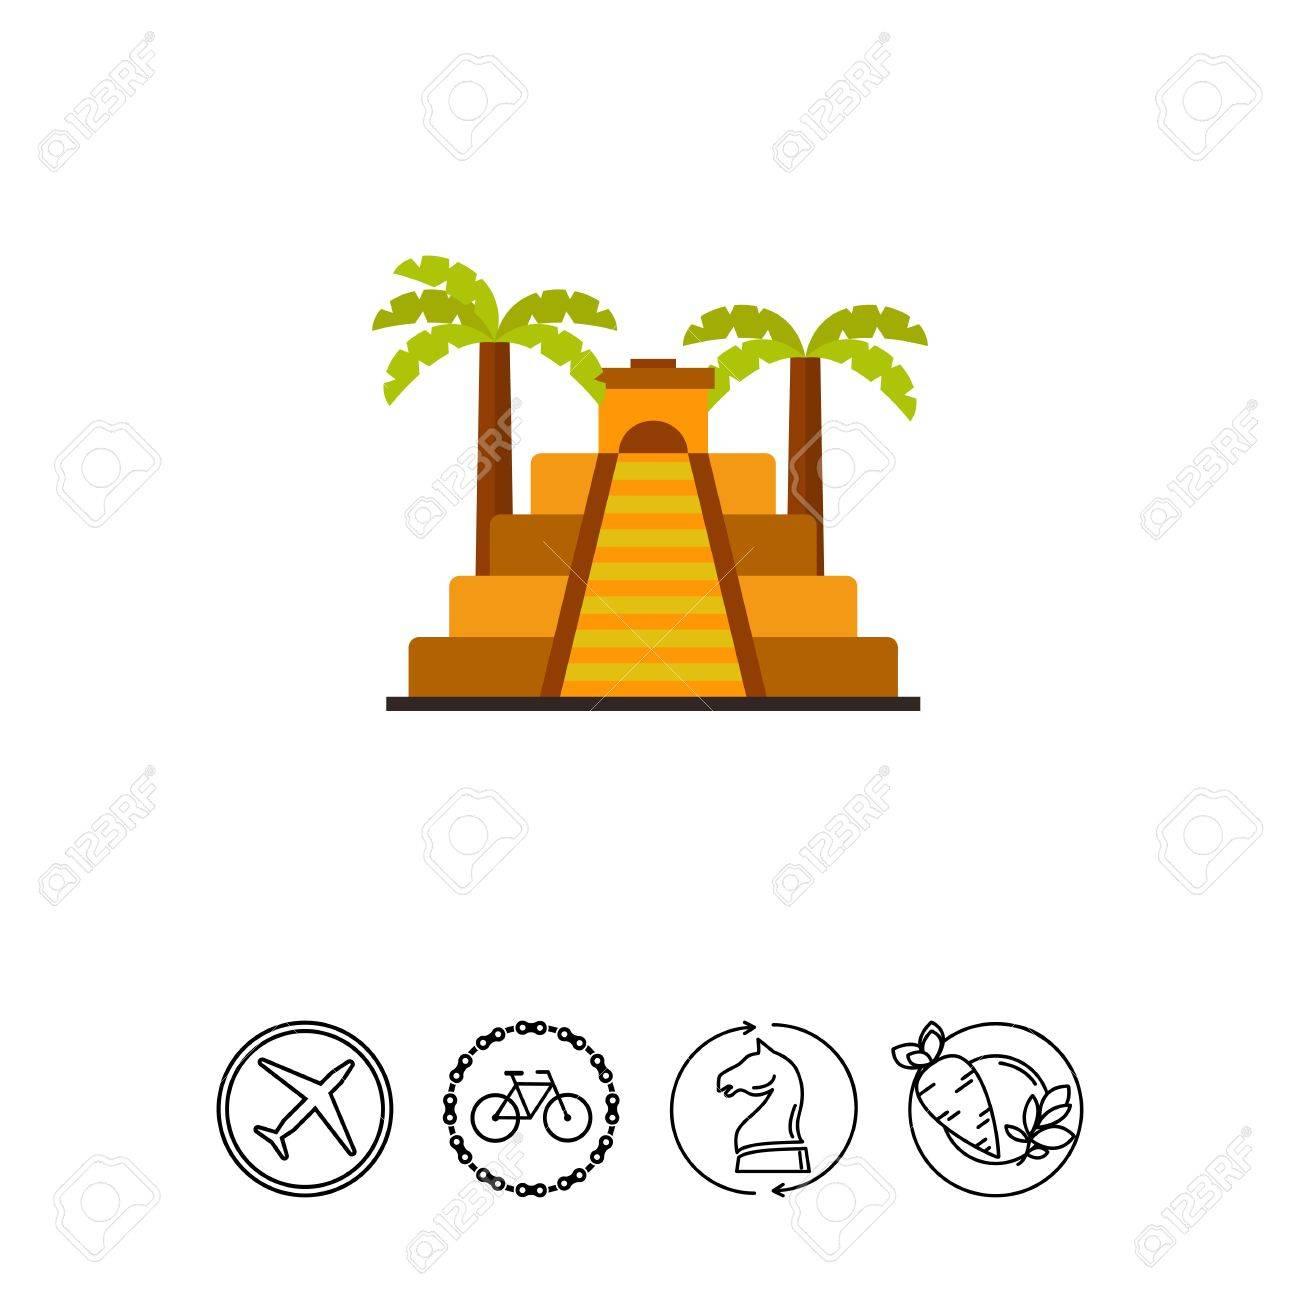 Icon of Aztec pyramid with palms  Aztec civilization, ziggurat,